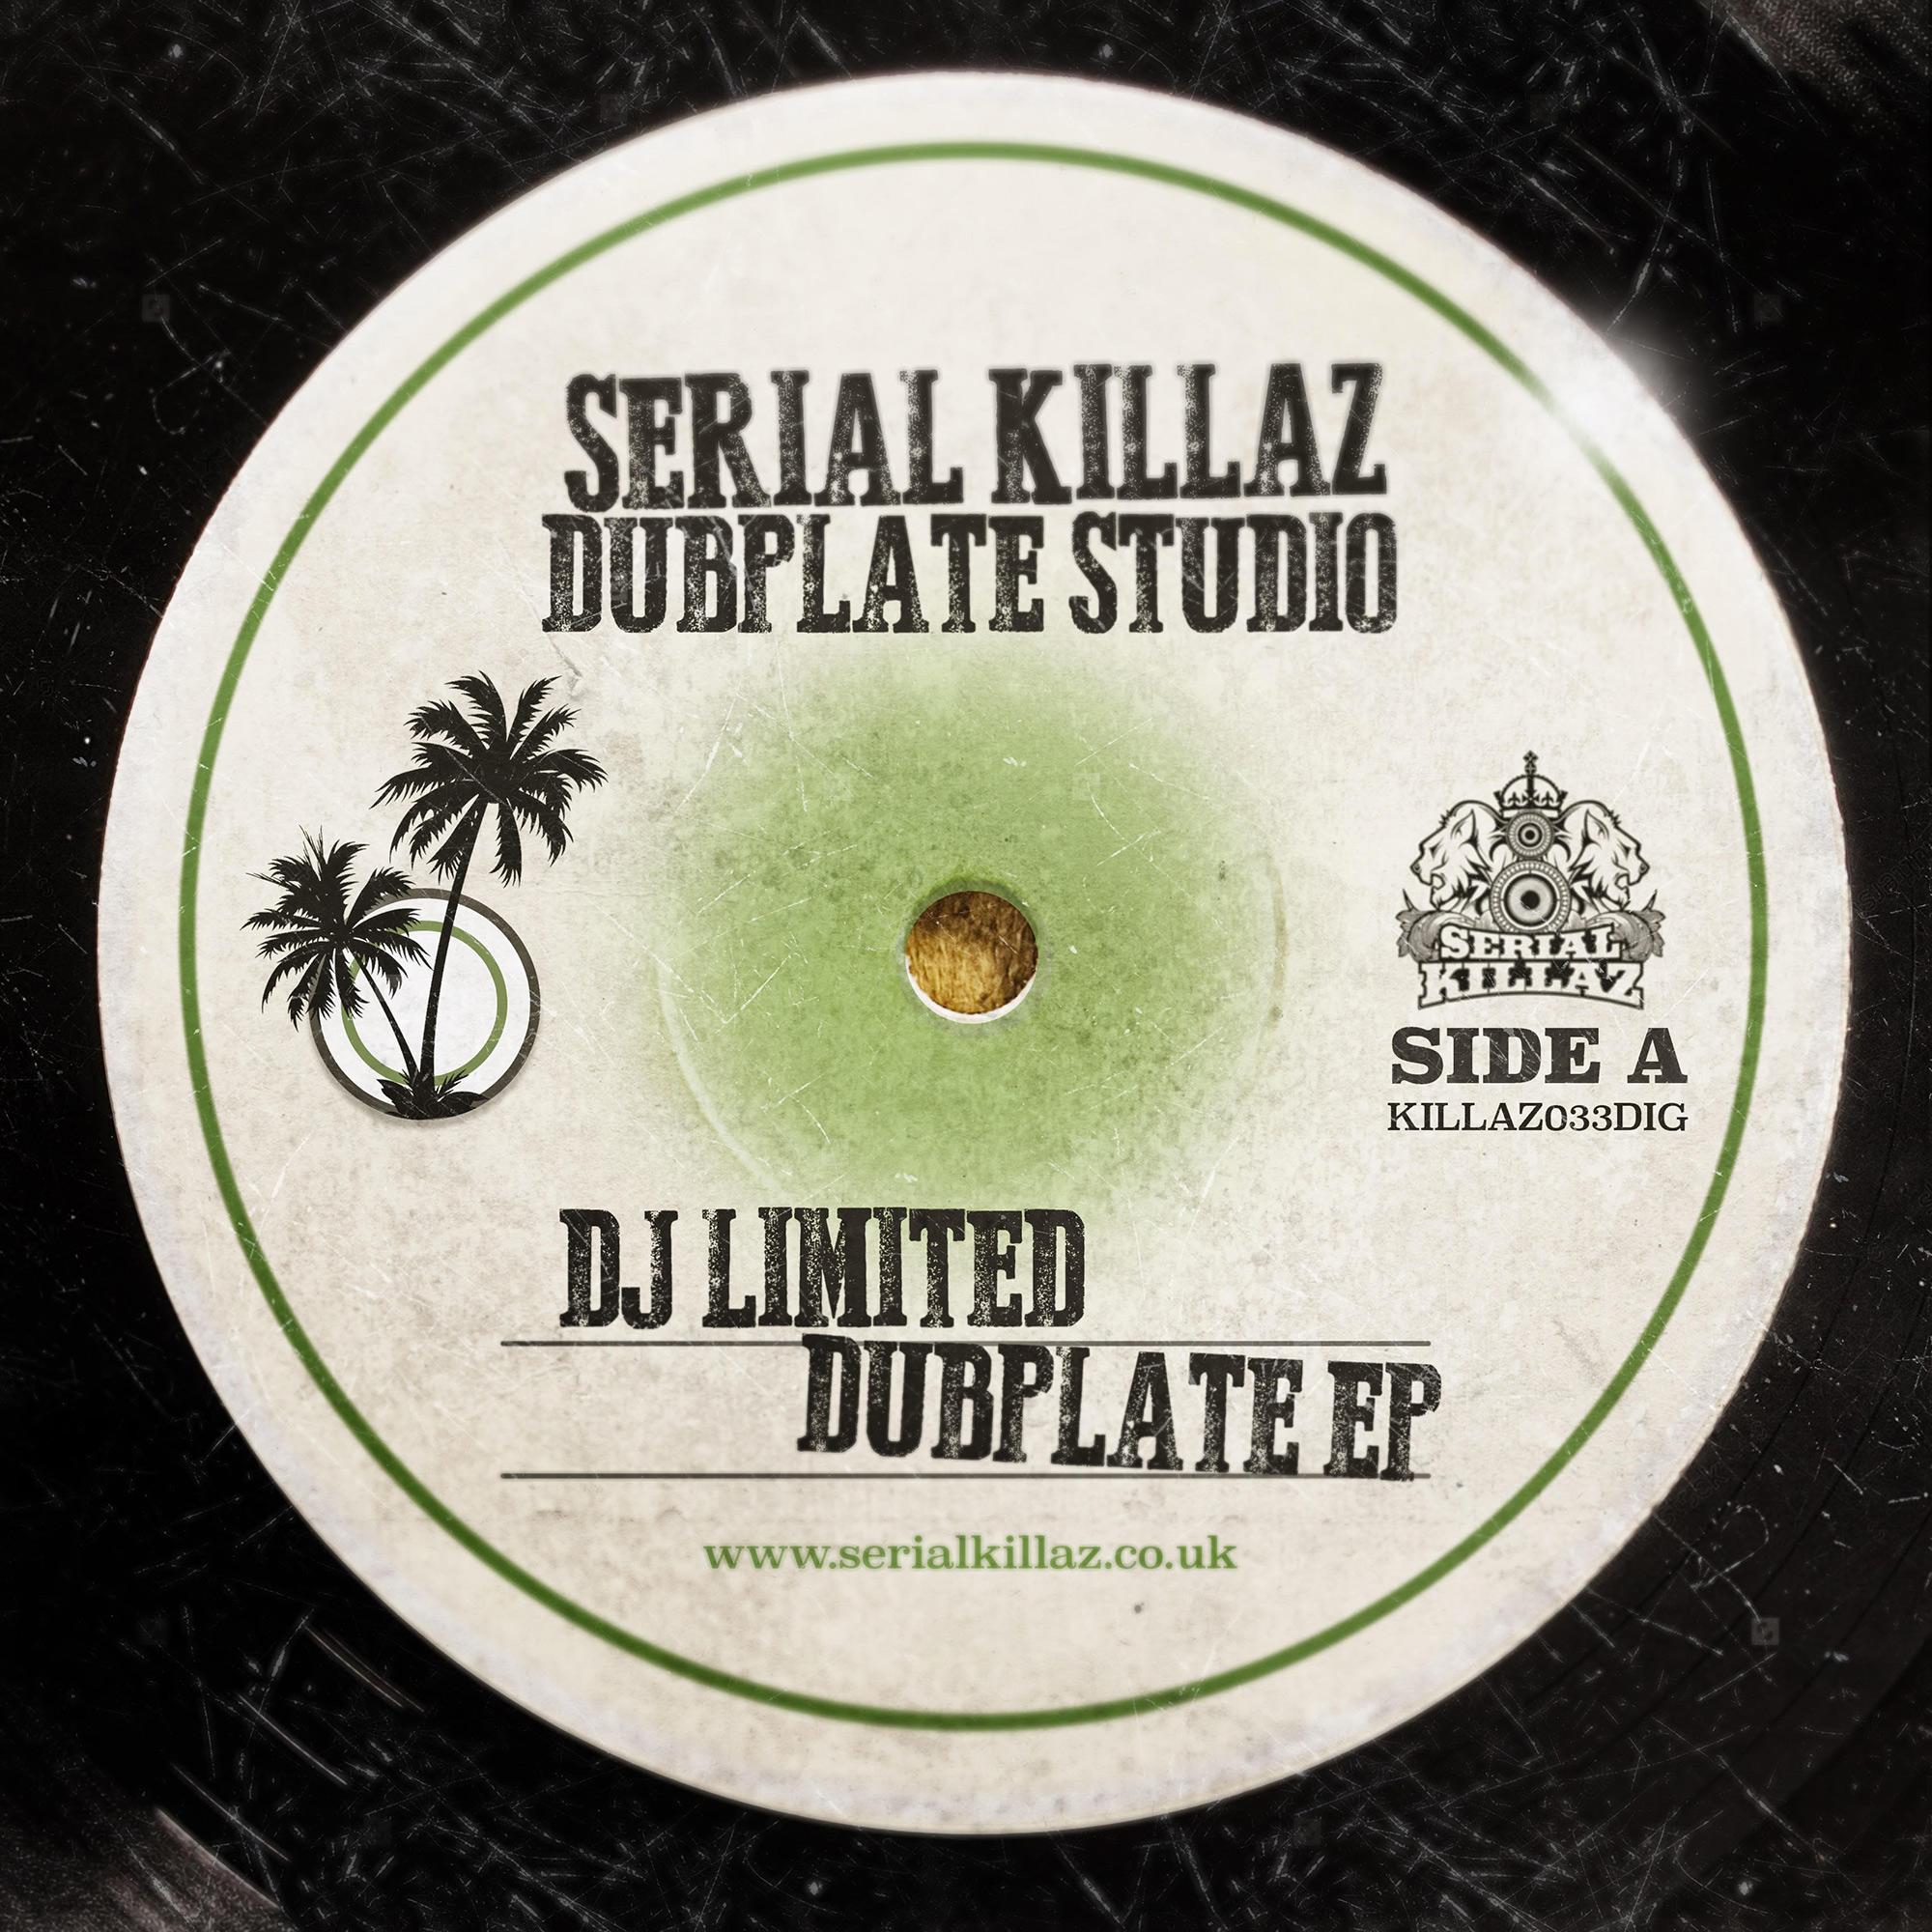 DJ Limited  - Dubplate EP